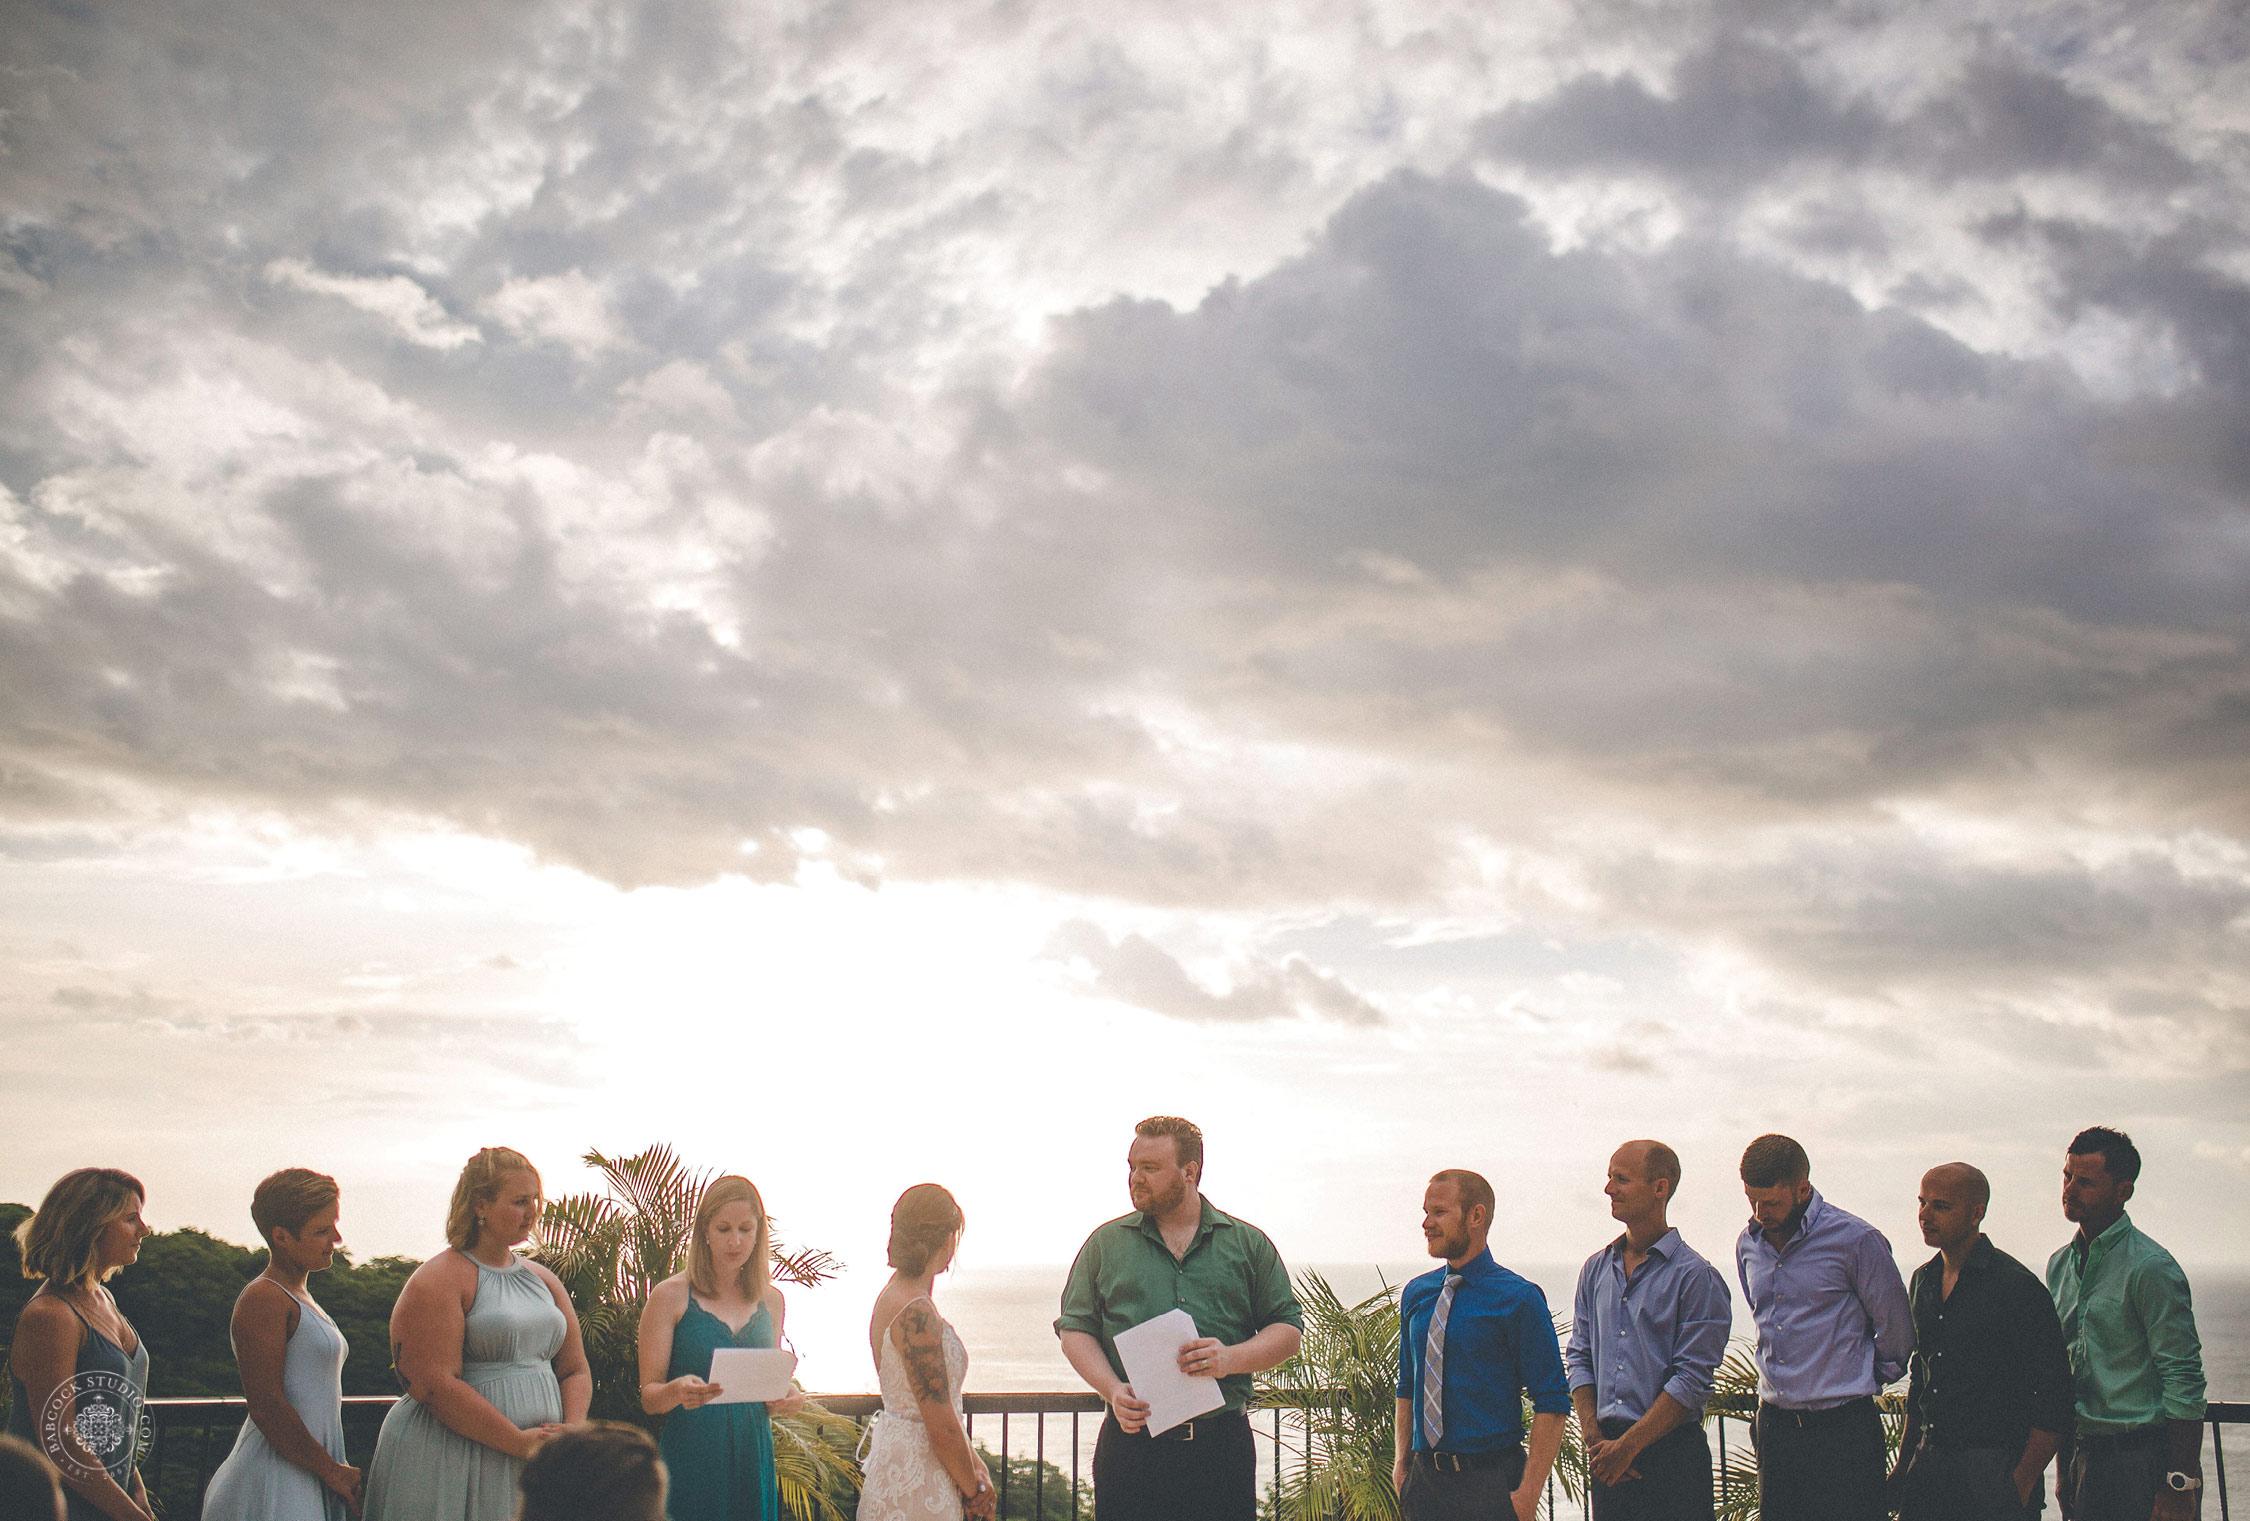 2cat-brandon-costa-rica-destination-wedding-photographer-dayton-ohio-19.jpg